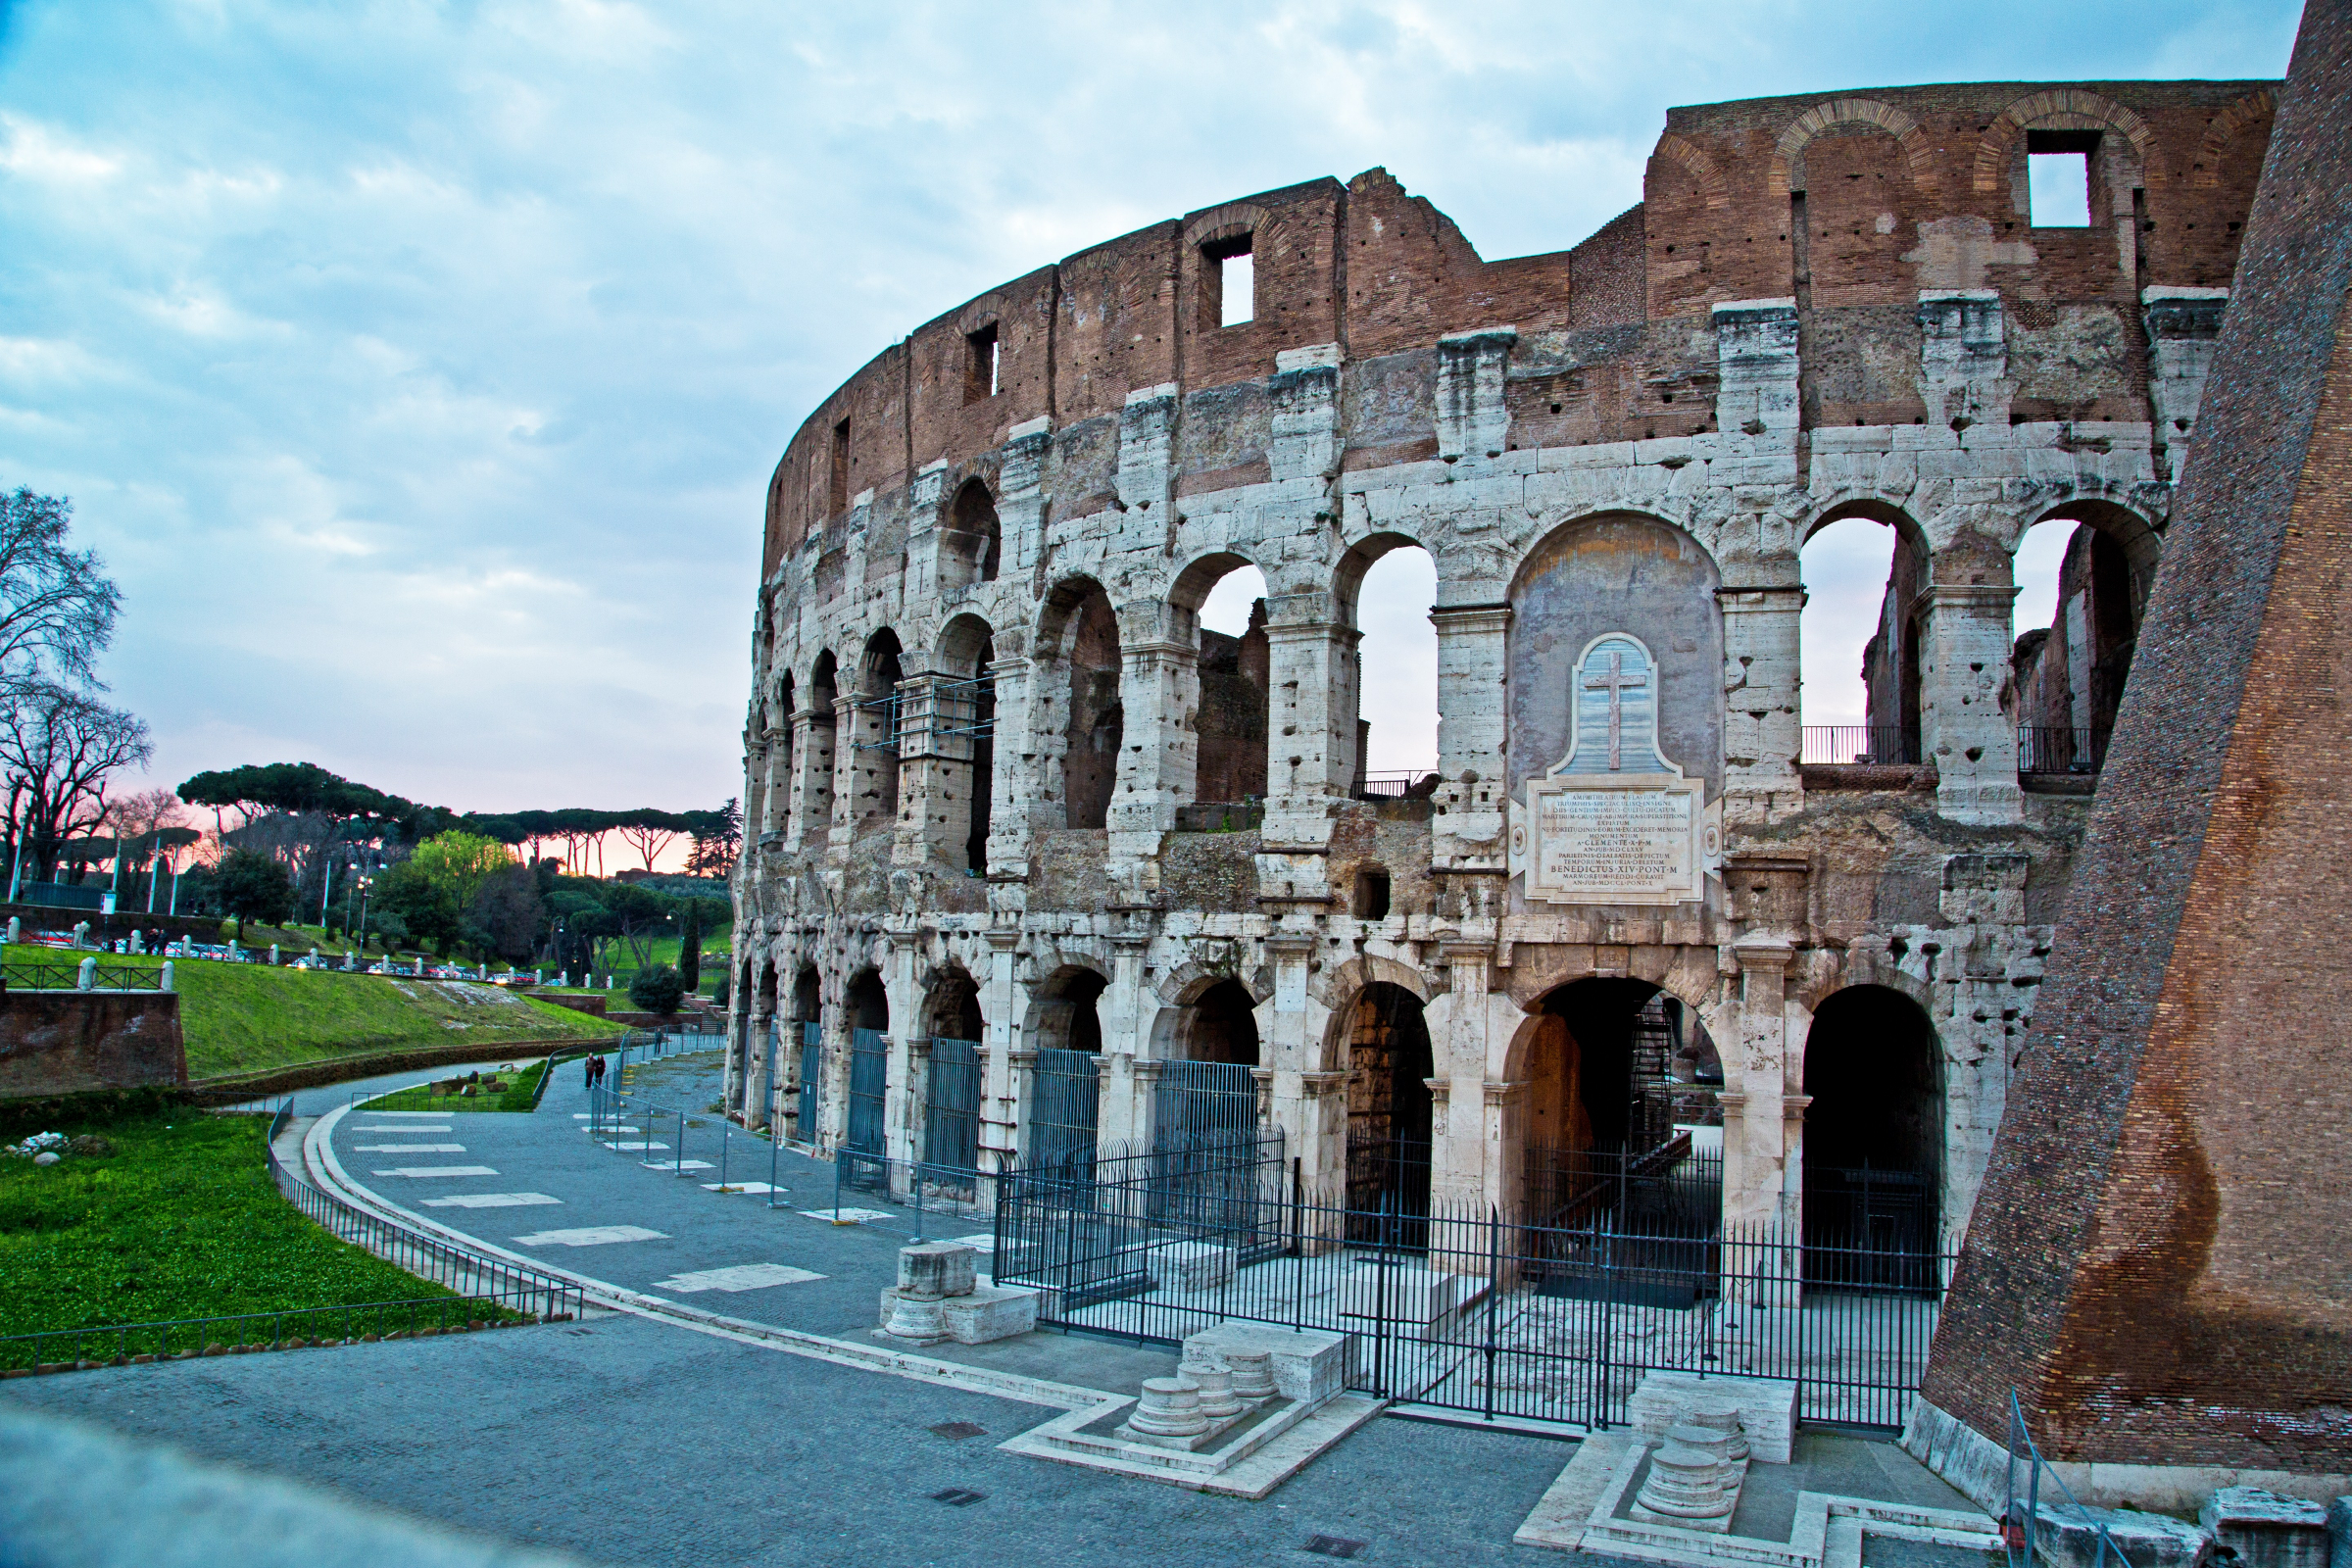 Amazing Wallpaper Night Colosseum - colosseum-rome-1326576-wallpaper  You Should Have.jpg?download\u003dtrue